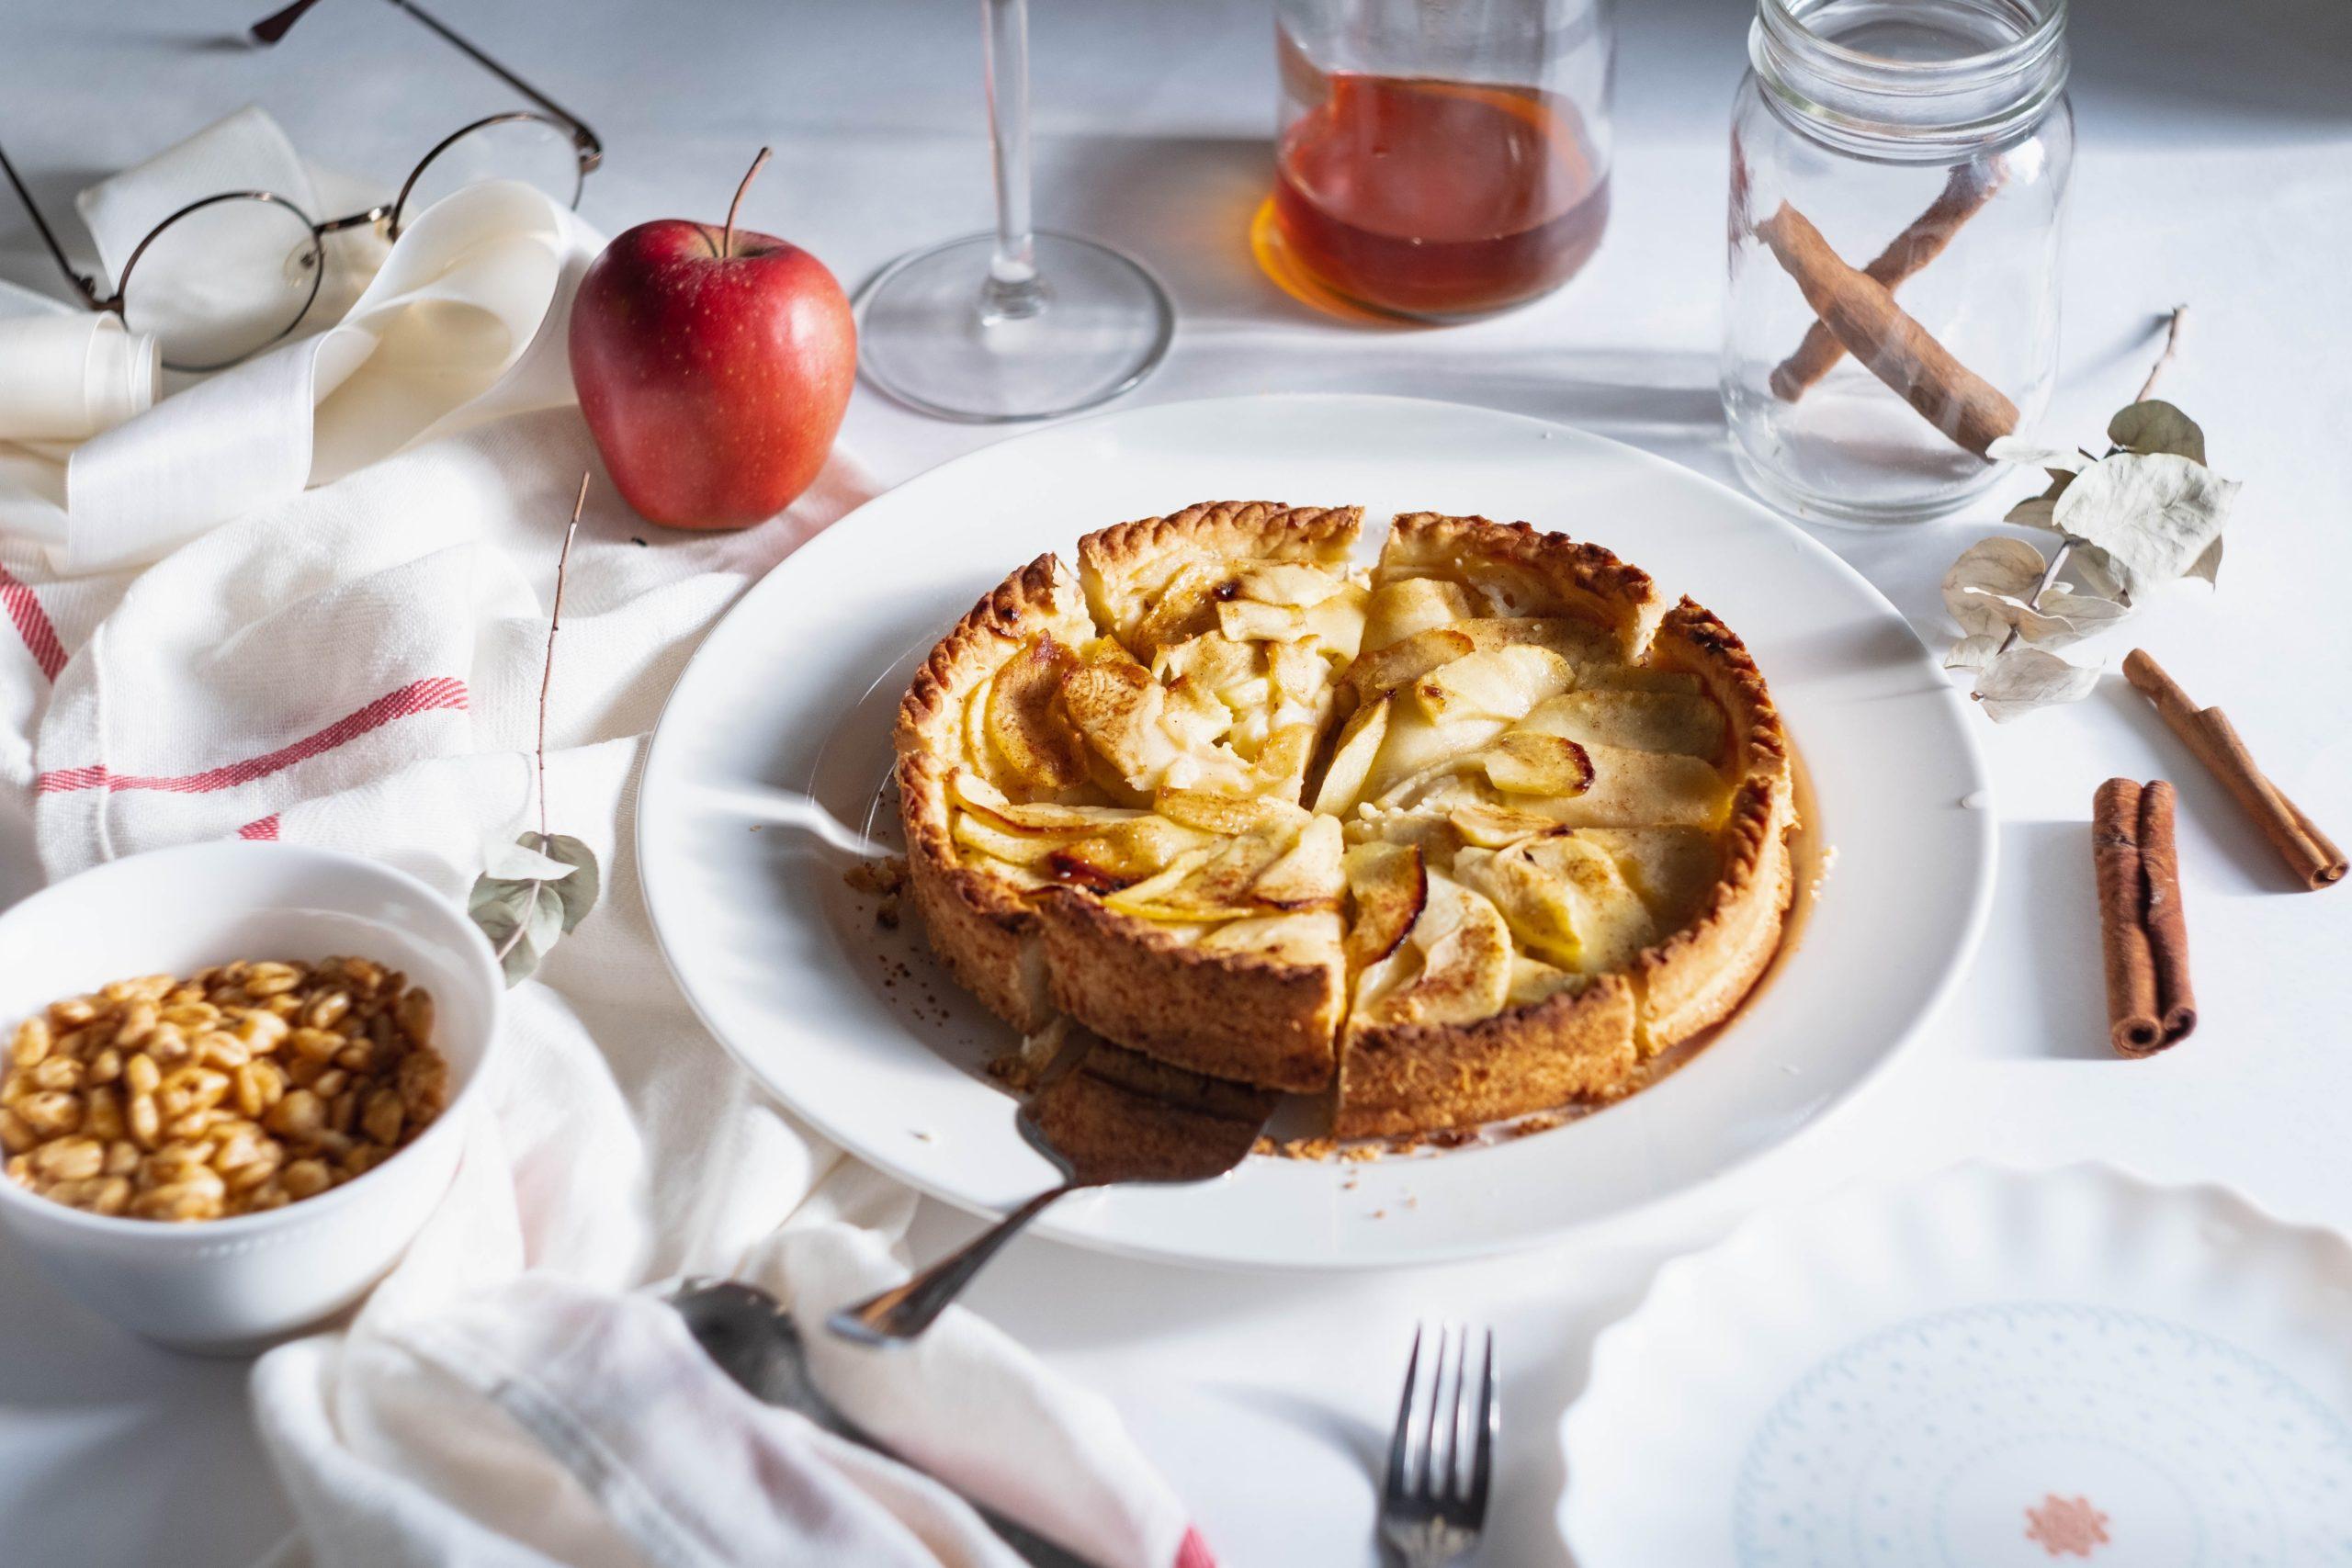 evolve blog apple pie with cinnamon sticks on table